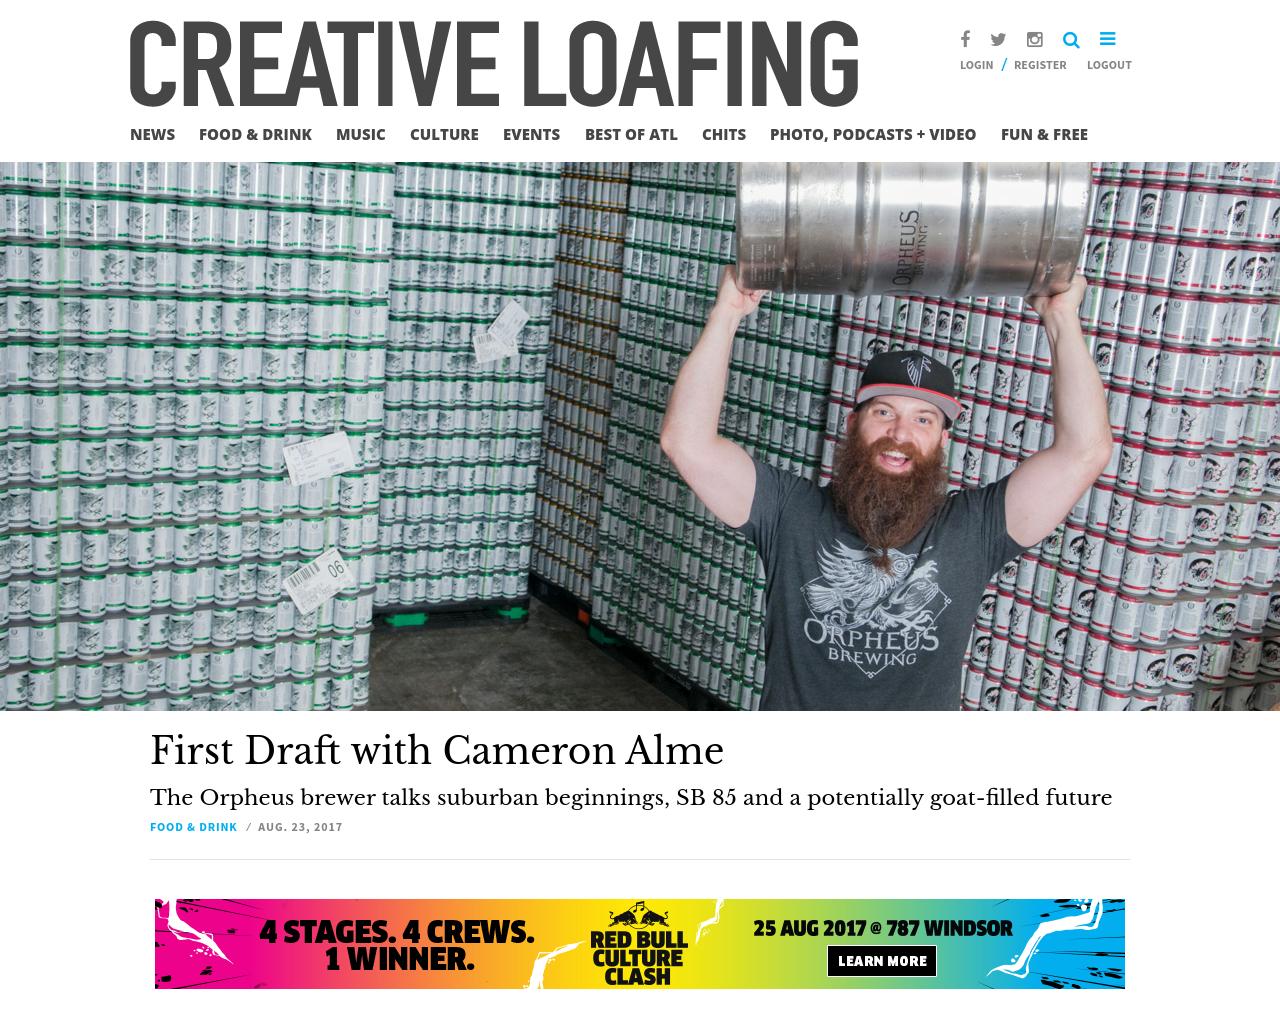 Creative-Loafing-Atlanta-Advertising-Reviews-Pricing